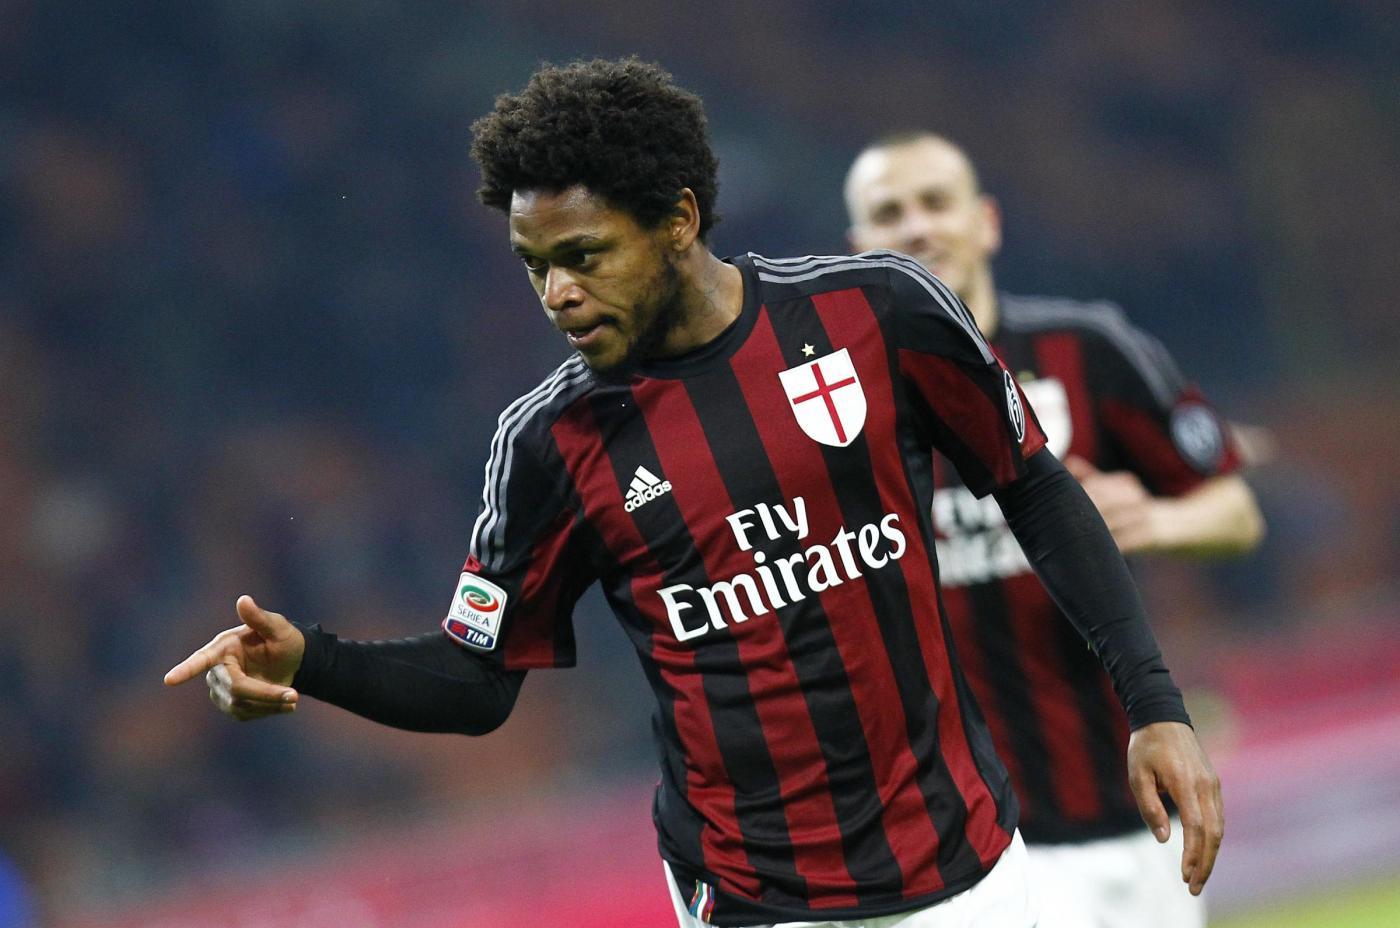 Calciomercato Milan: clamoroso, Luiz Adriano resta